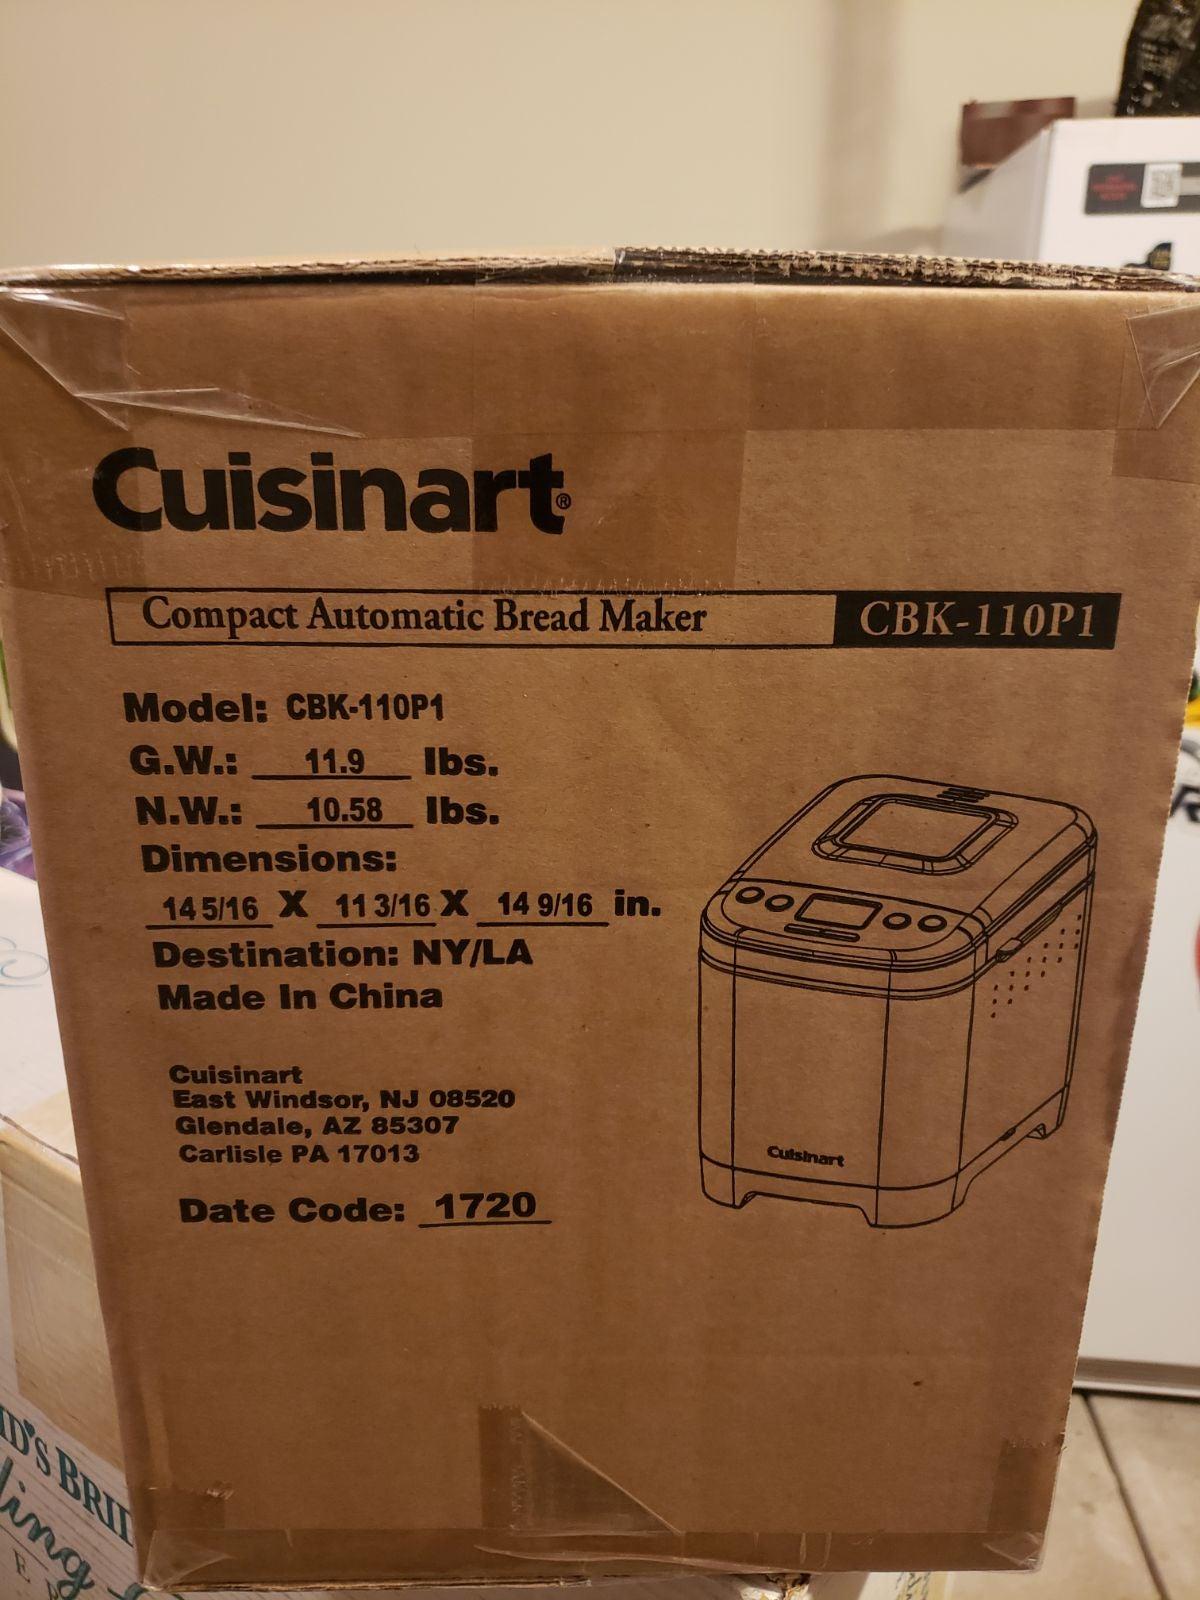 Cuisinart CBK-110P1 Bread Maker